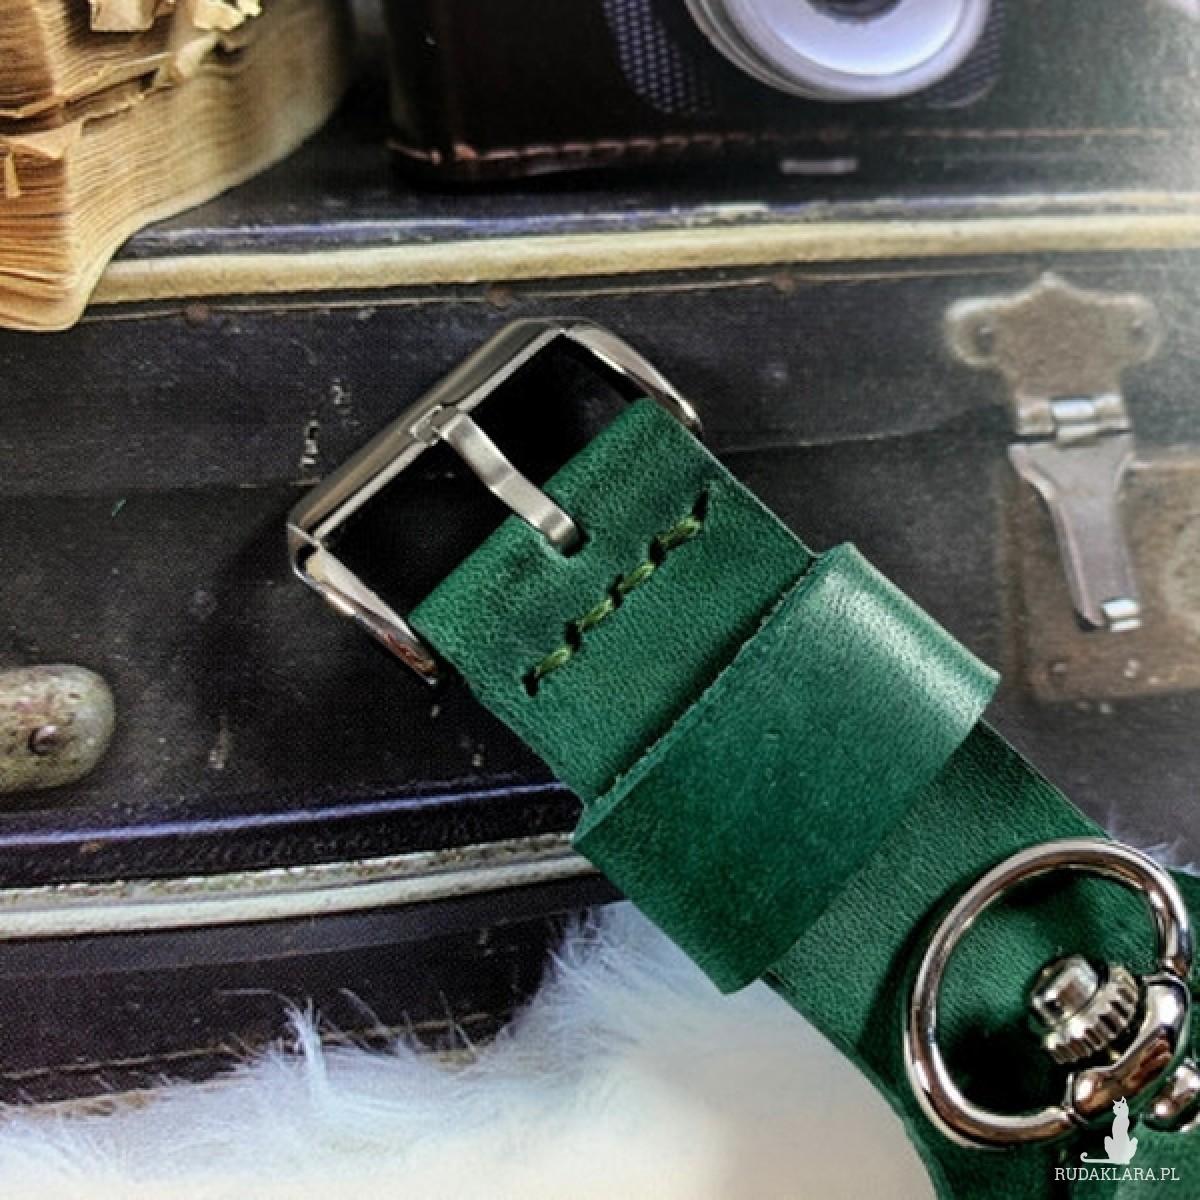 DC 041 - GREEN SPRING - Błękitny Obłęd